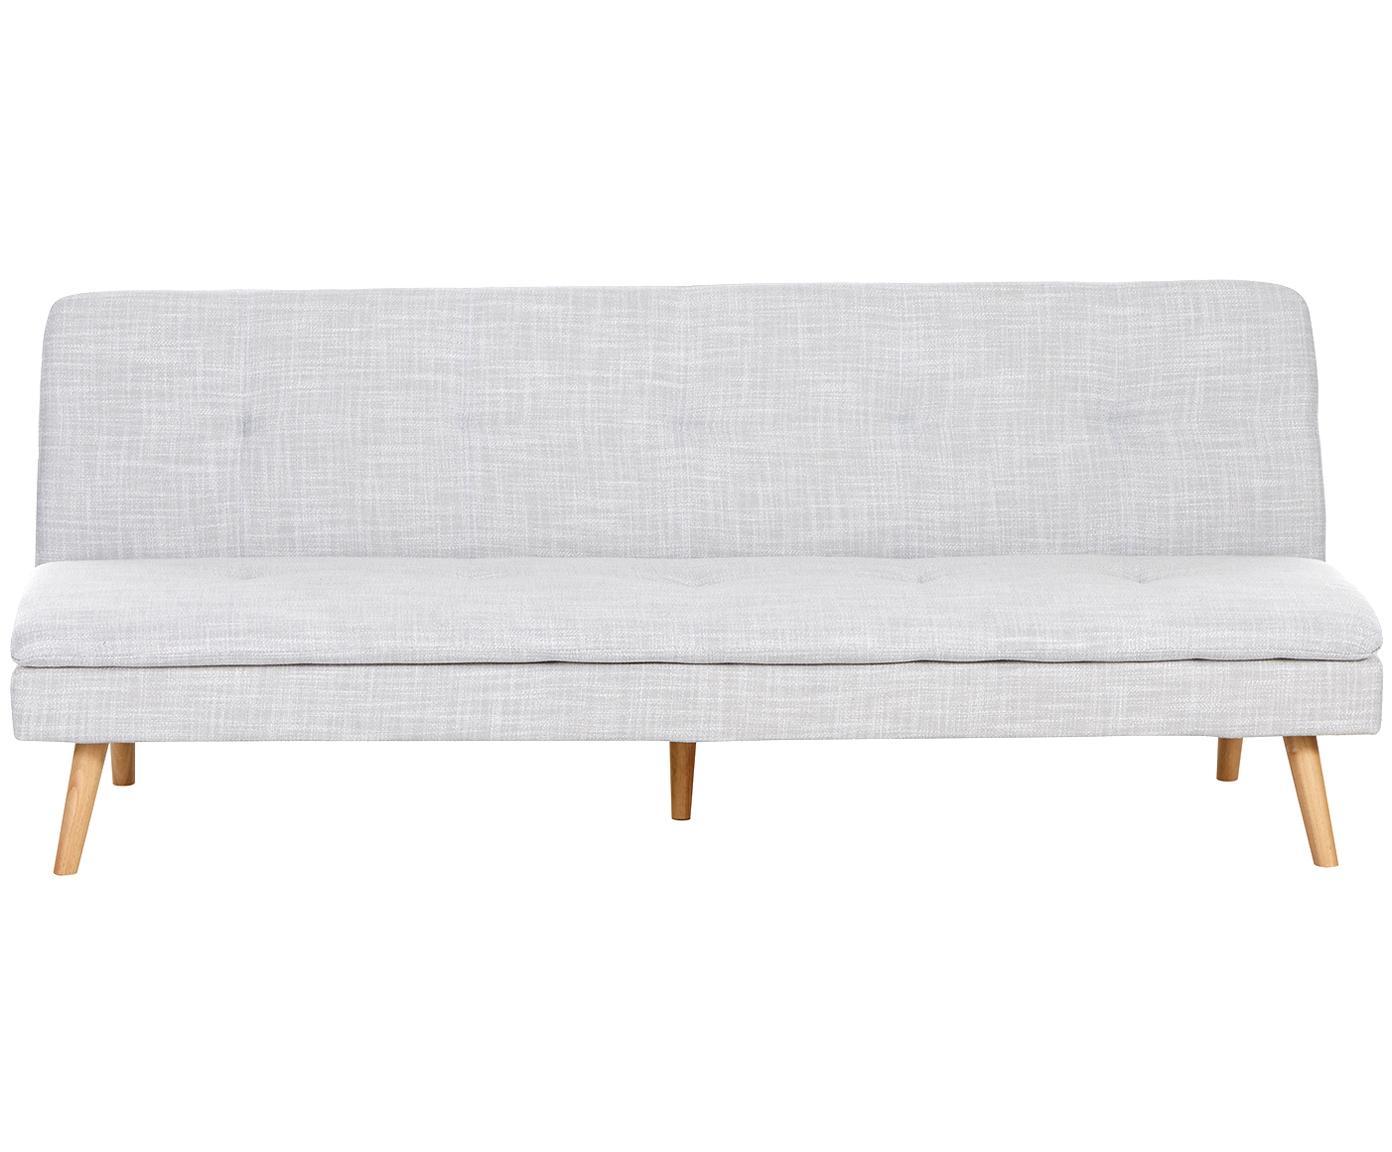 Slaapbank Amelie, Bekleding: polyester, Frame: grenenhout, Poten: rubberhout, Bekleding: lichtgrijs. Poten: rubberhoutkleurig, 200 x 79 cm